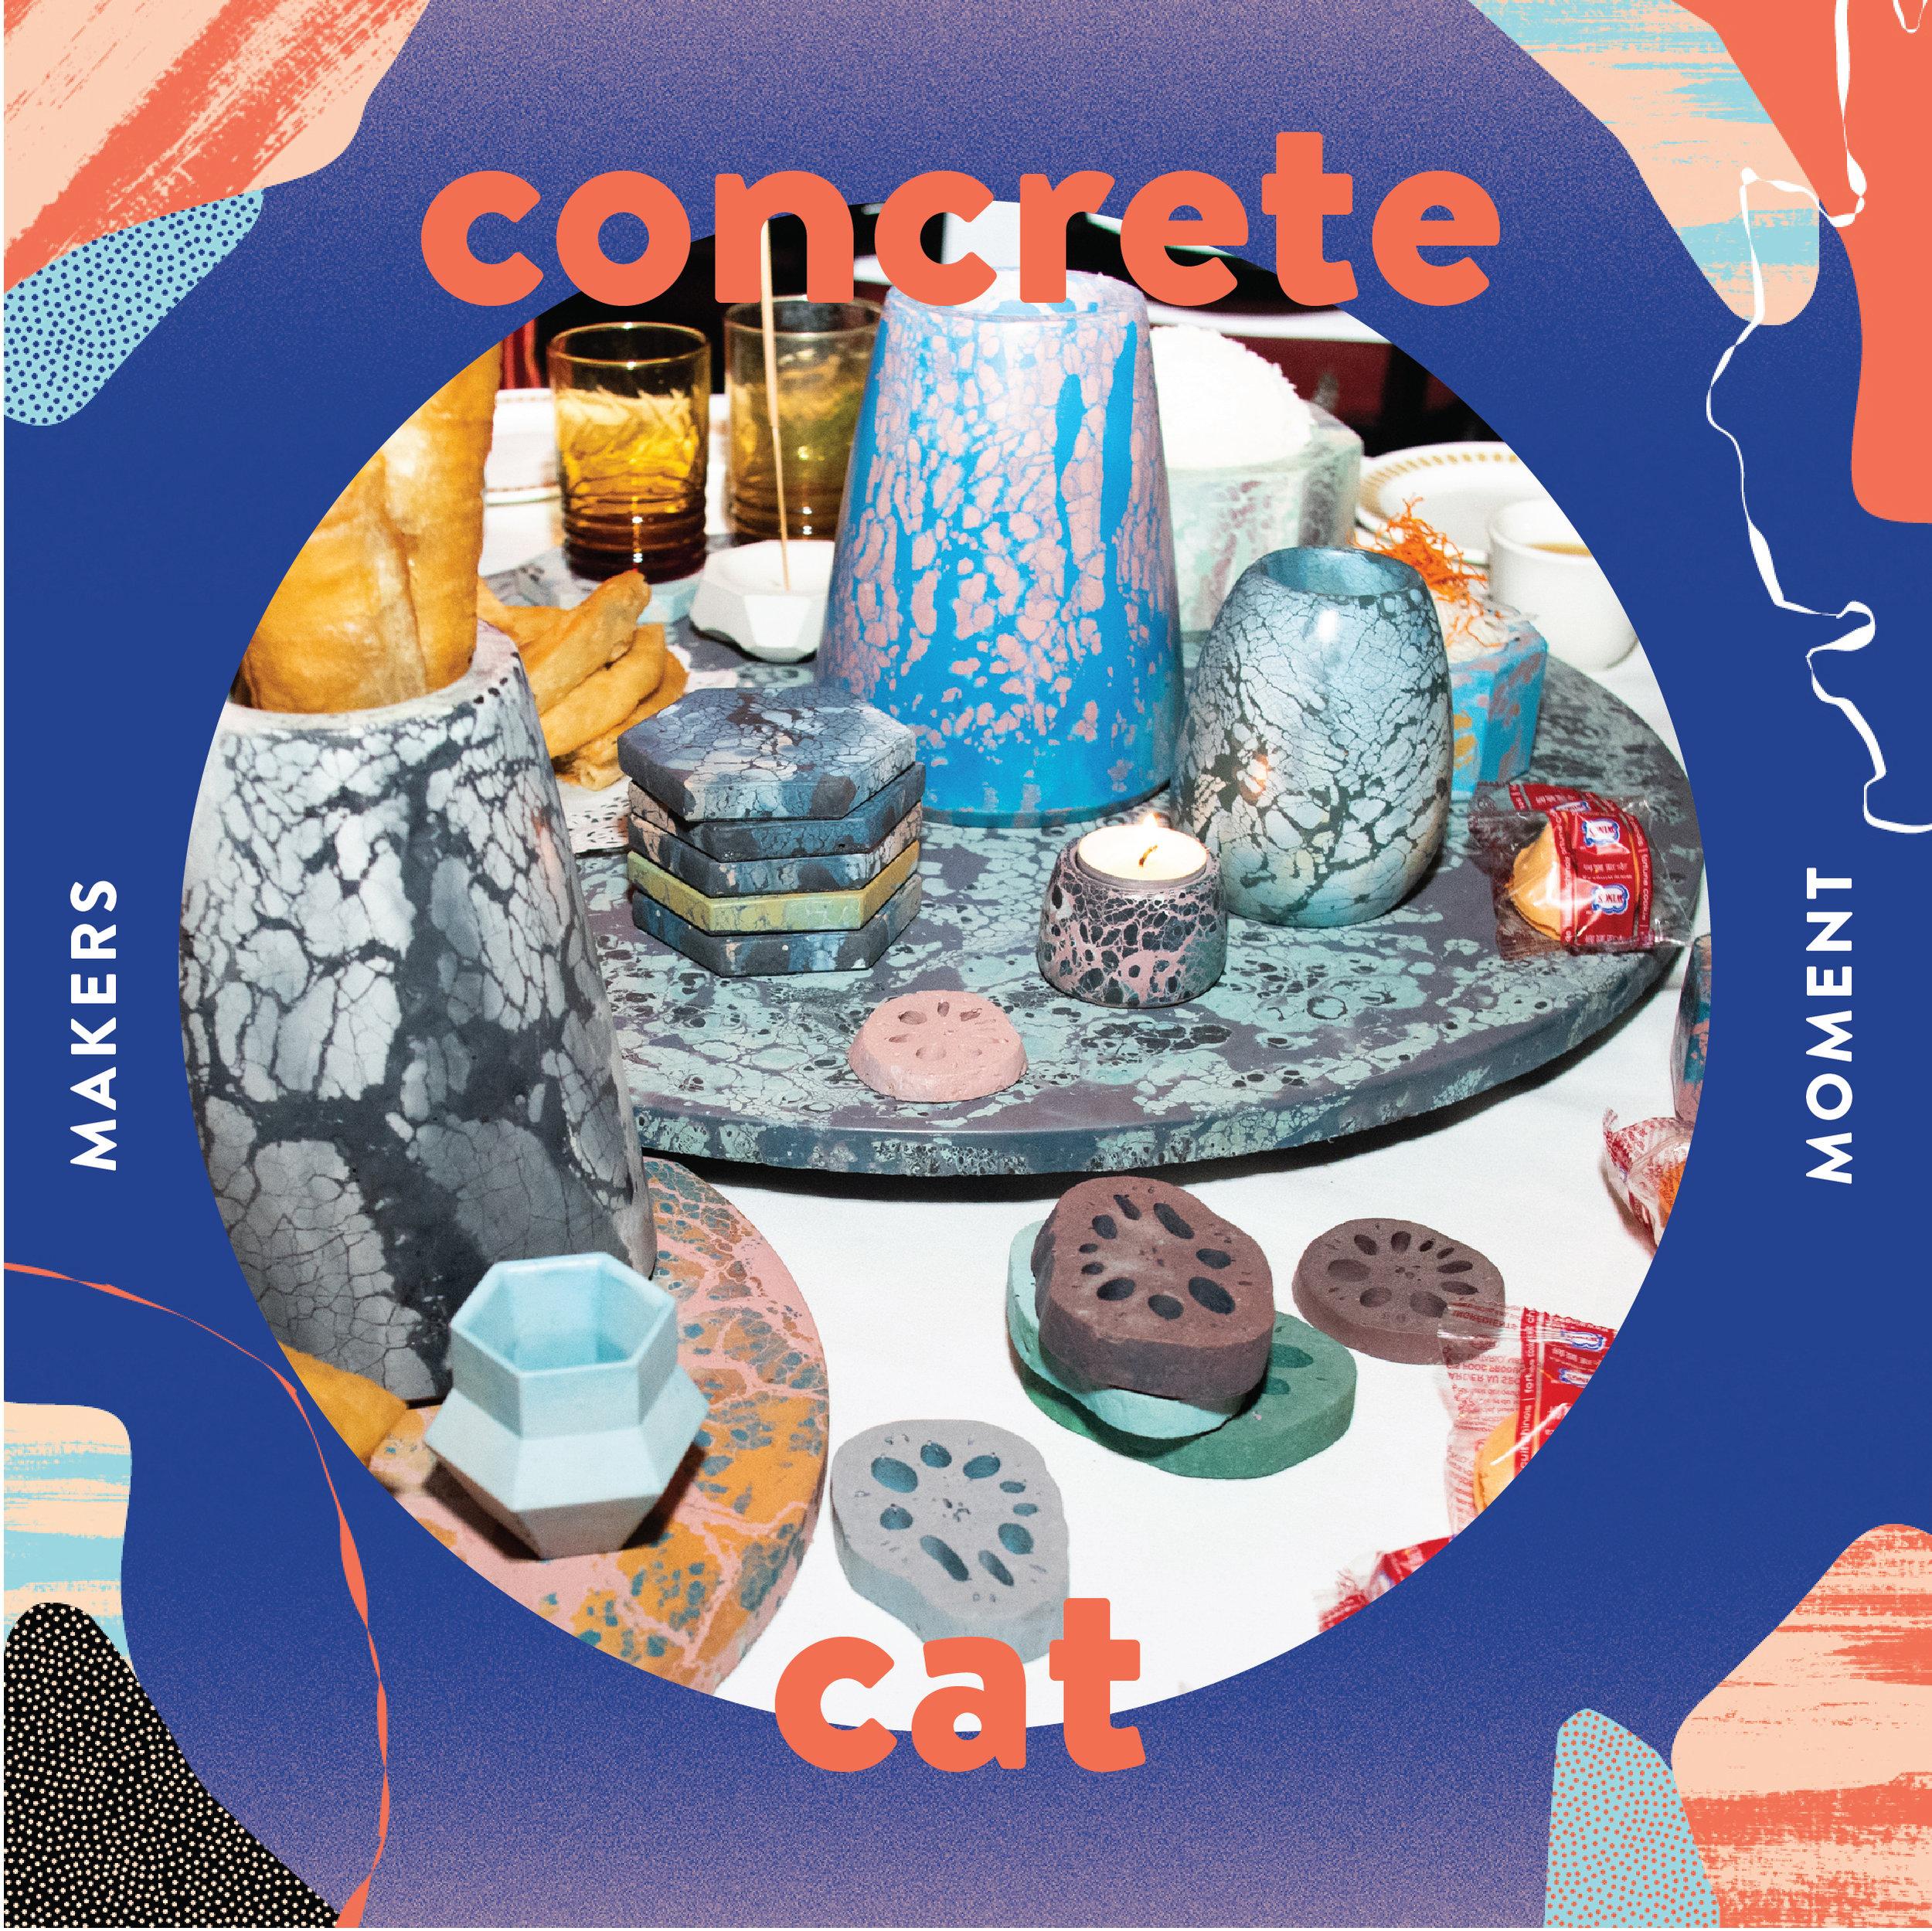 makersmomentpodcast-concretecat